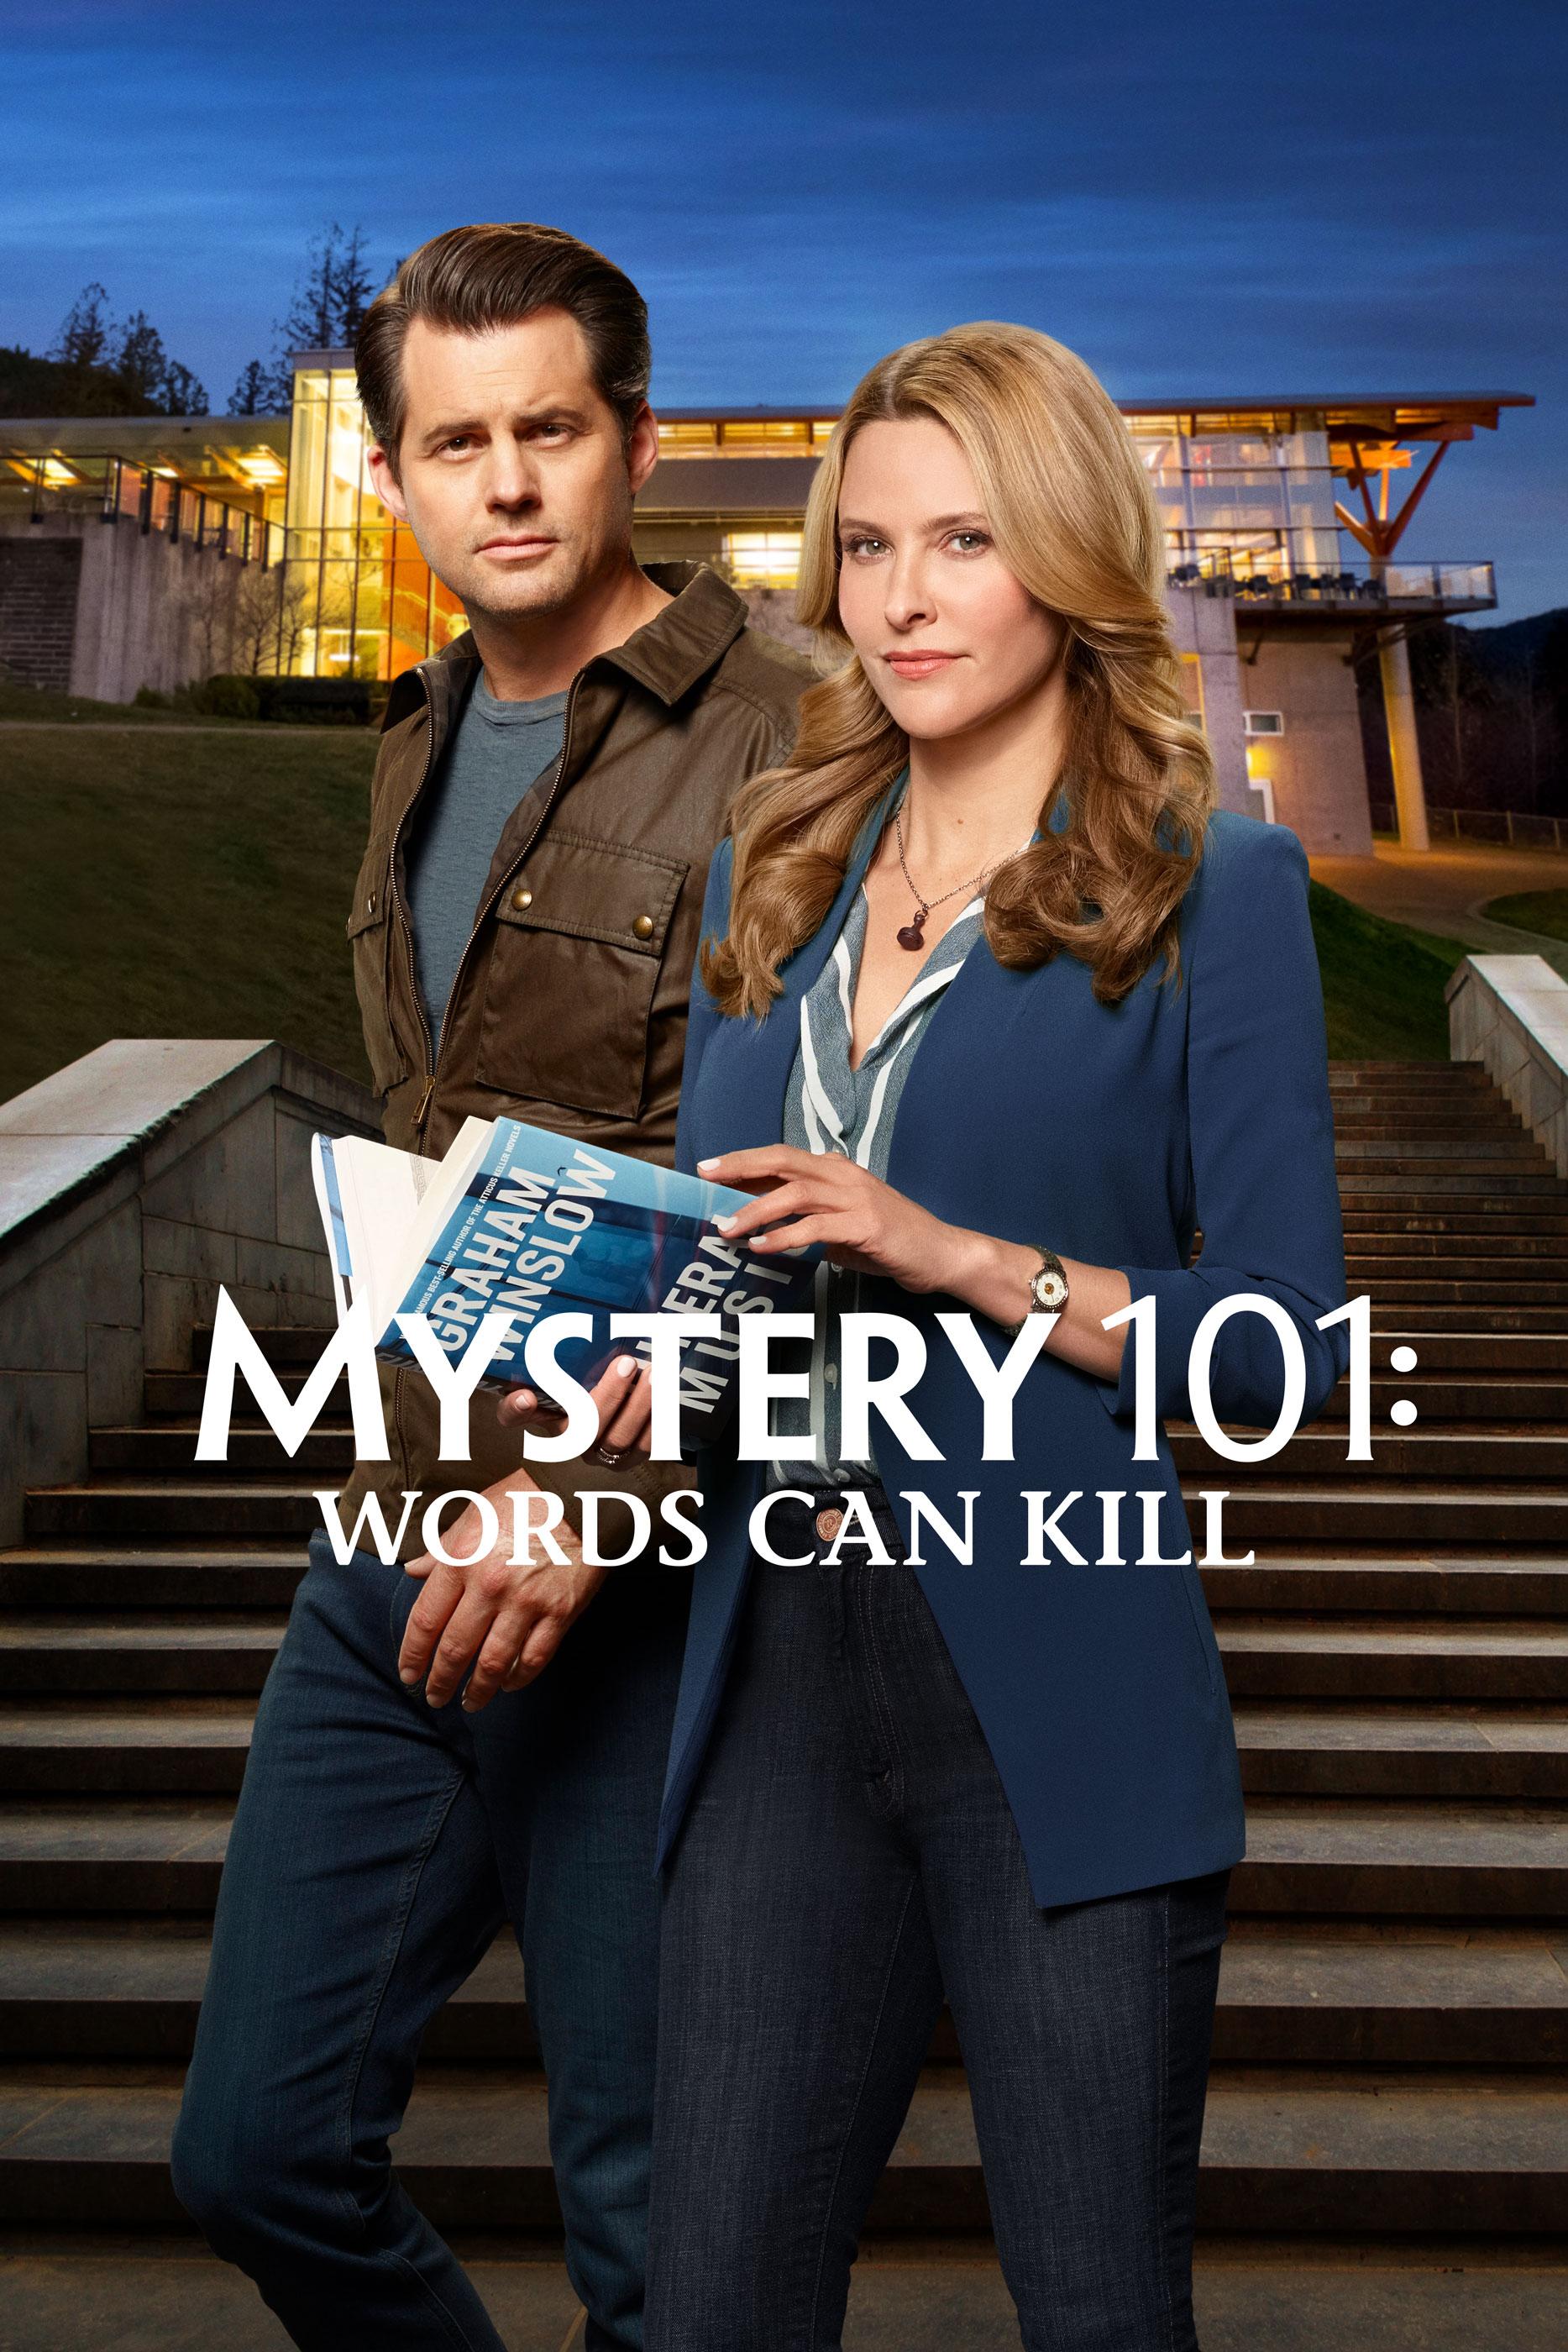 MYSTERY 101: WORDS CAN KLL